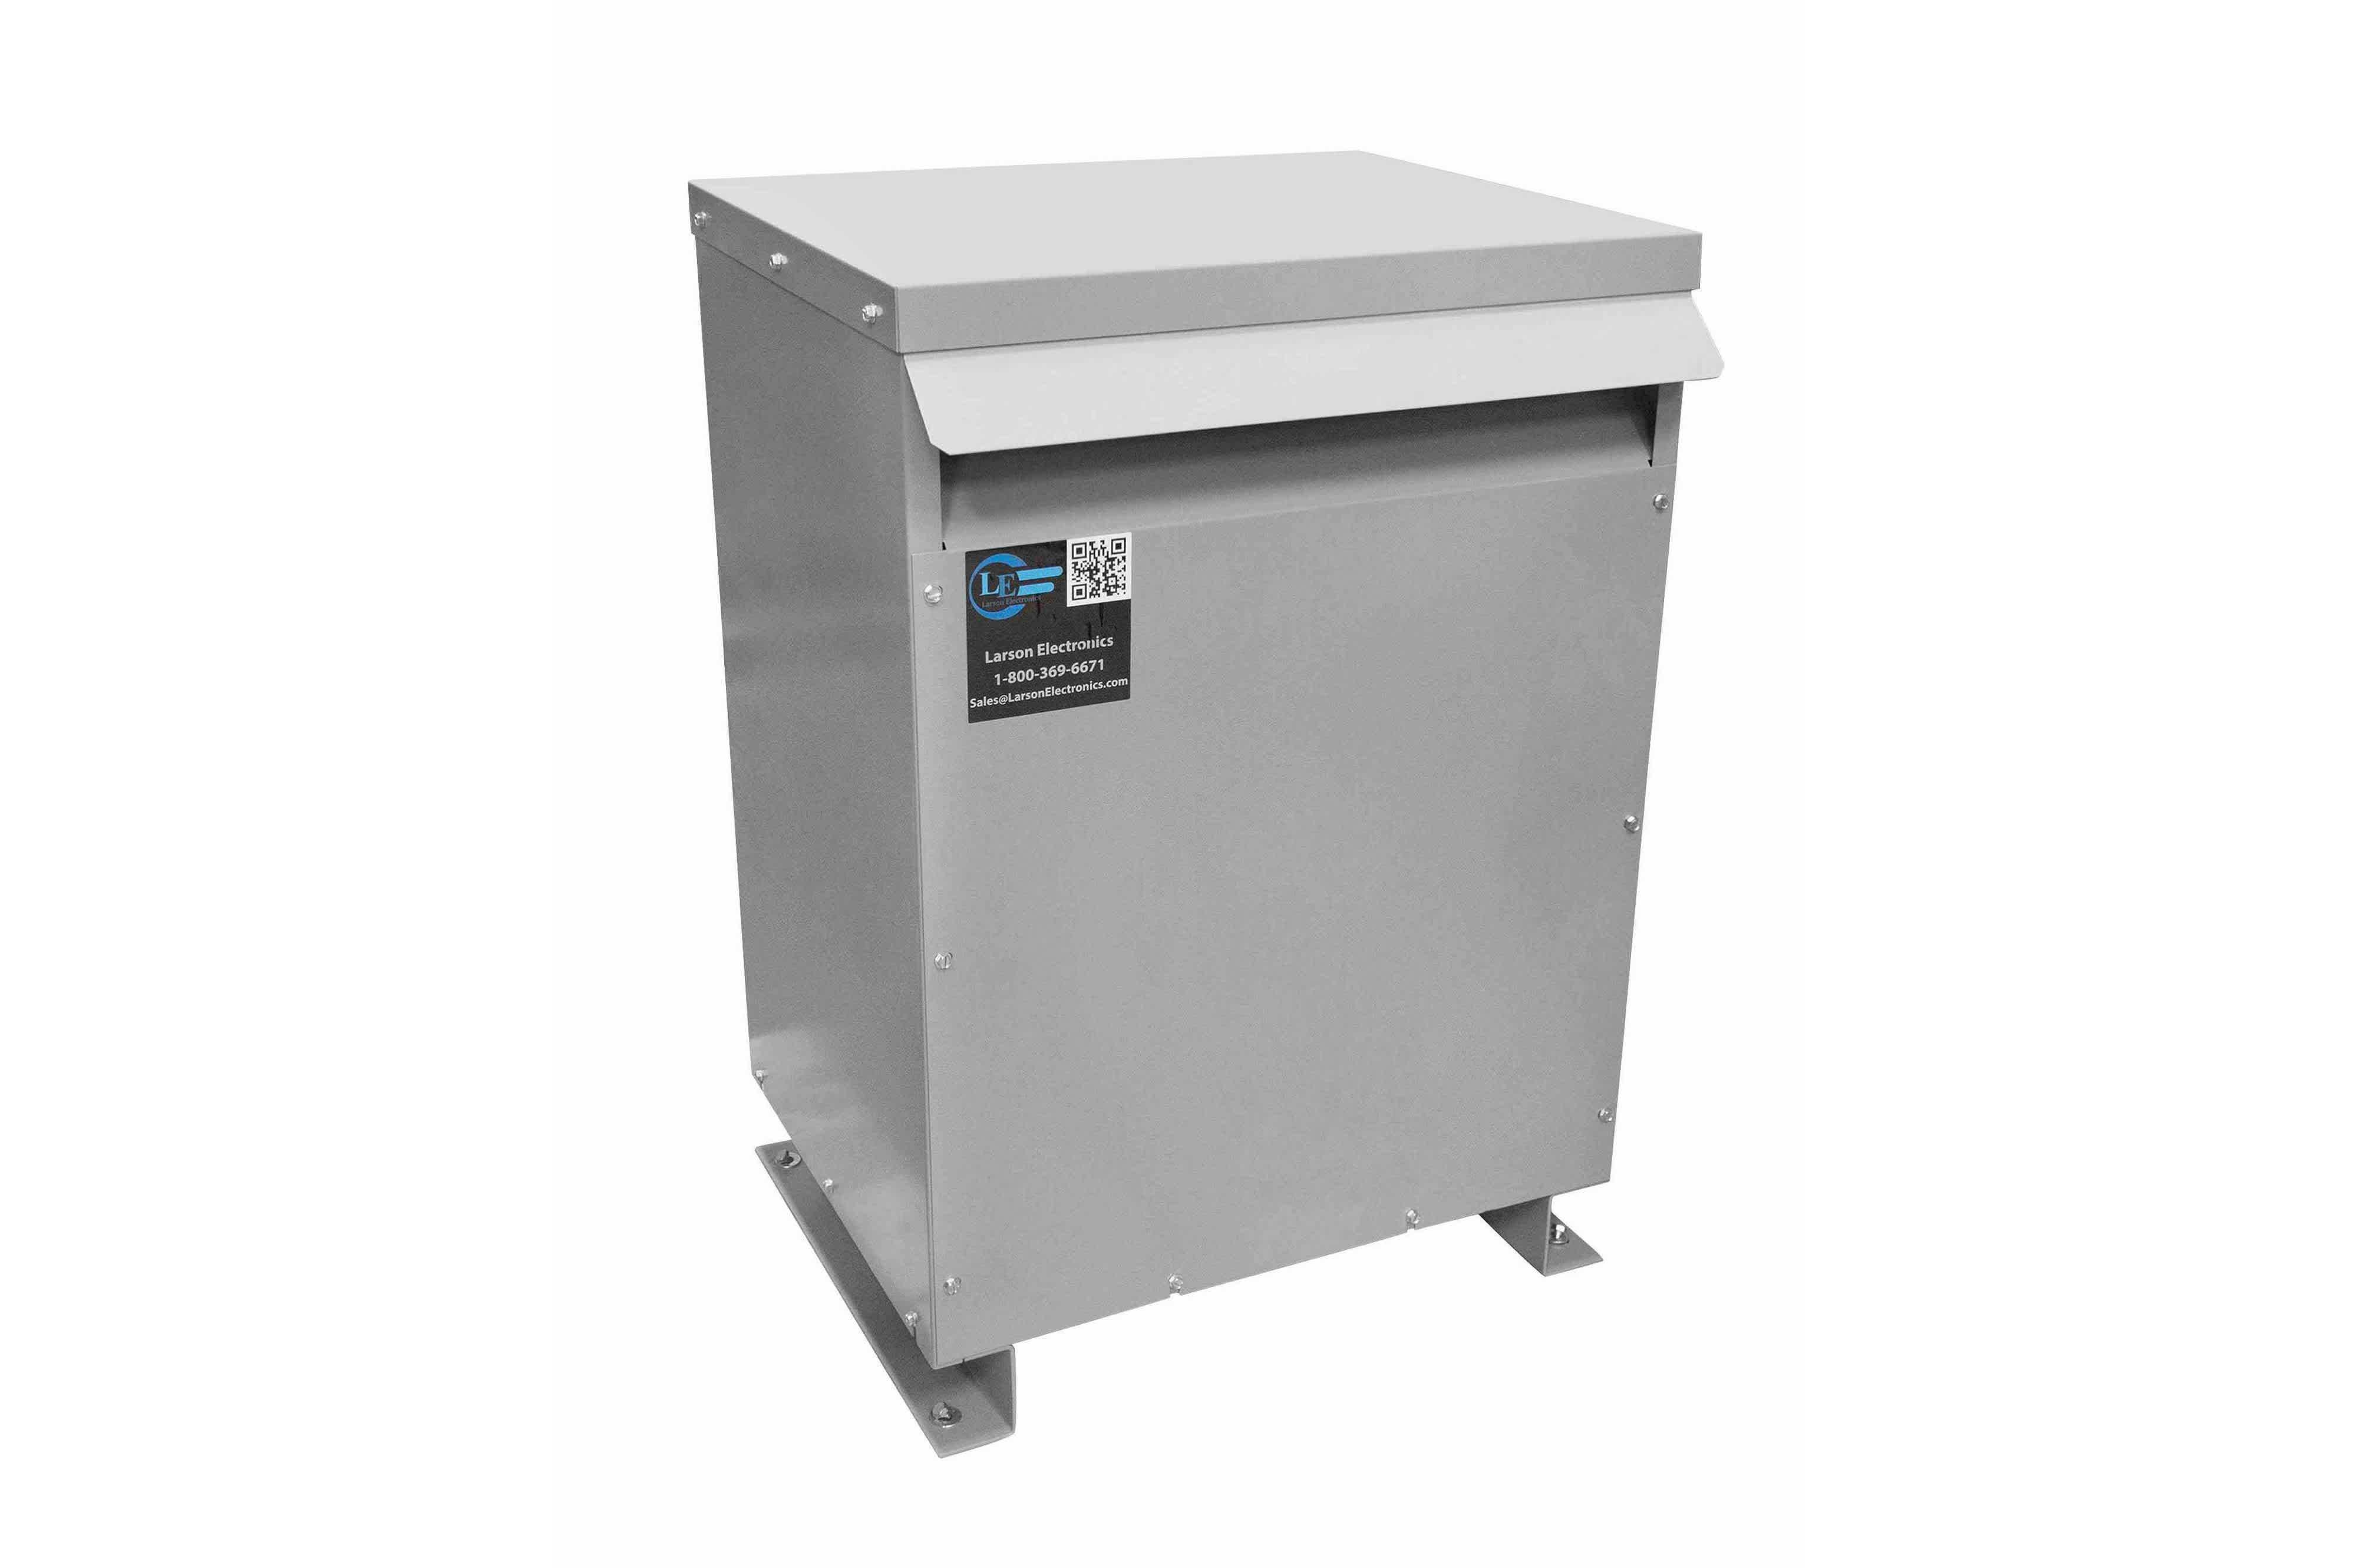 275 kVA 3PH Isolation Transformer, 600V Wye Primary, 460Y/266 Wye-N Secondary, N3R, Ventilated, 60 Hz